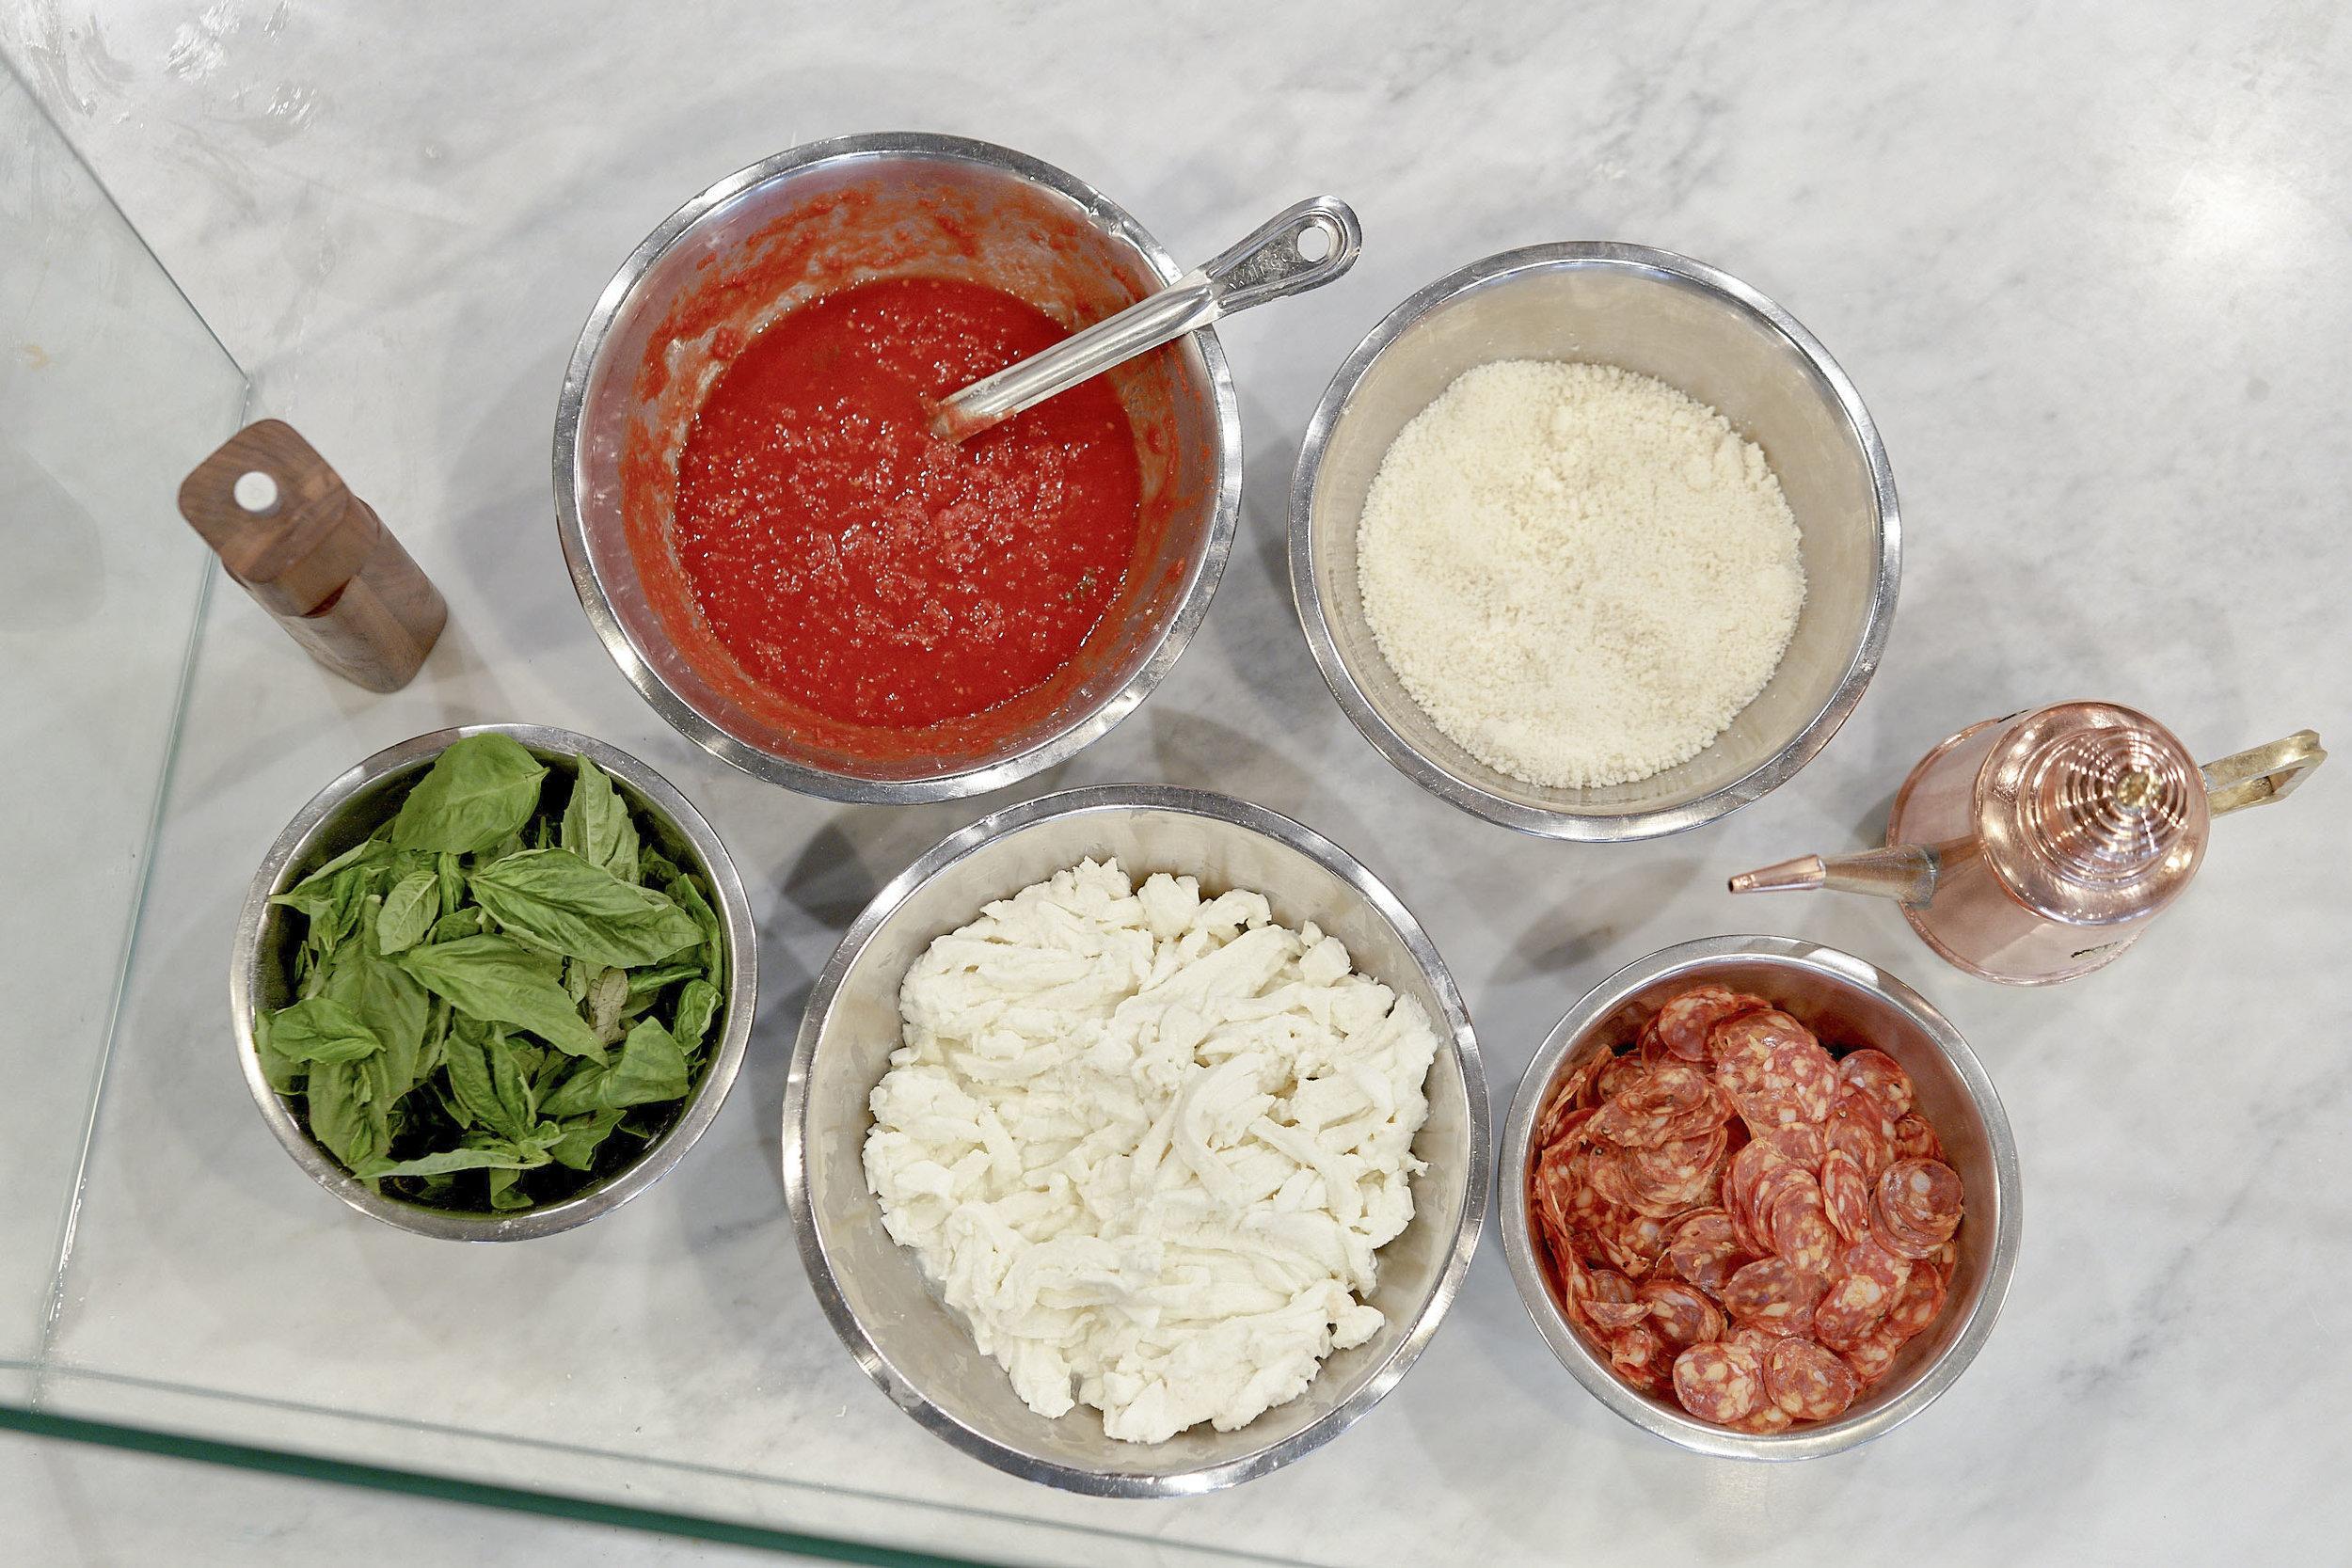 Ingredients_10_SimoPizza_FSP7730 HighRes Q100.jpg